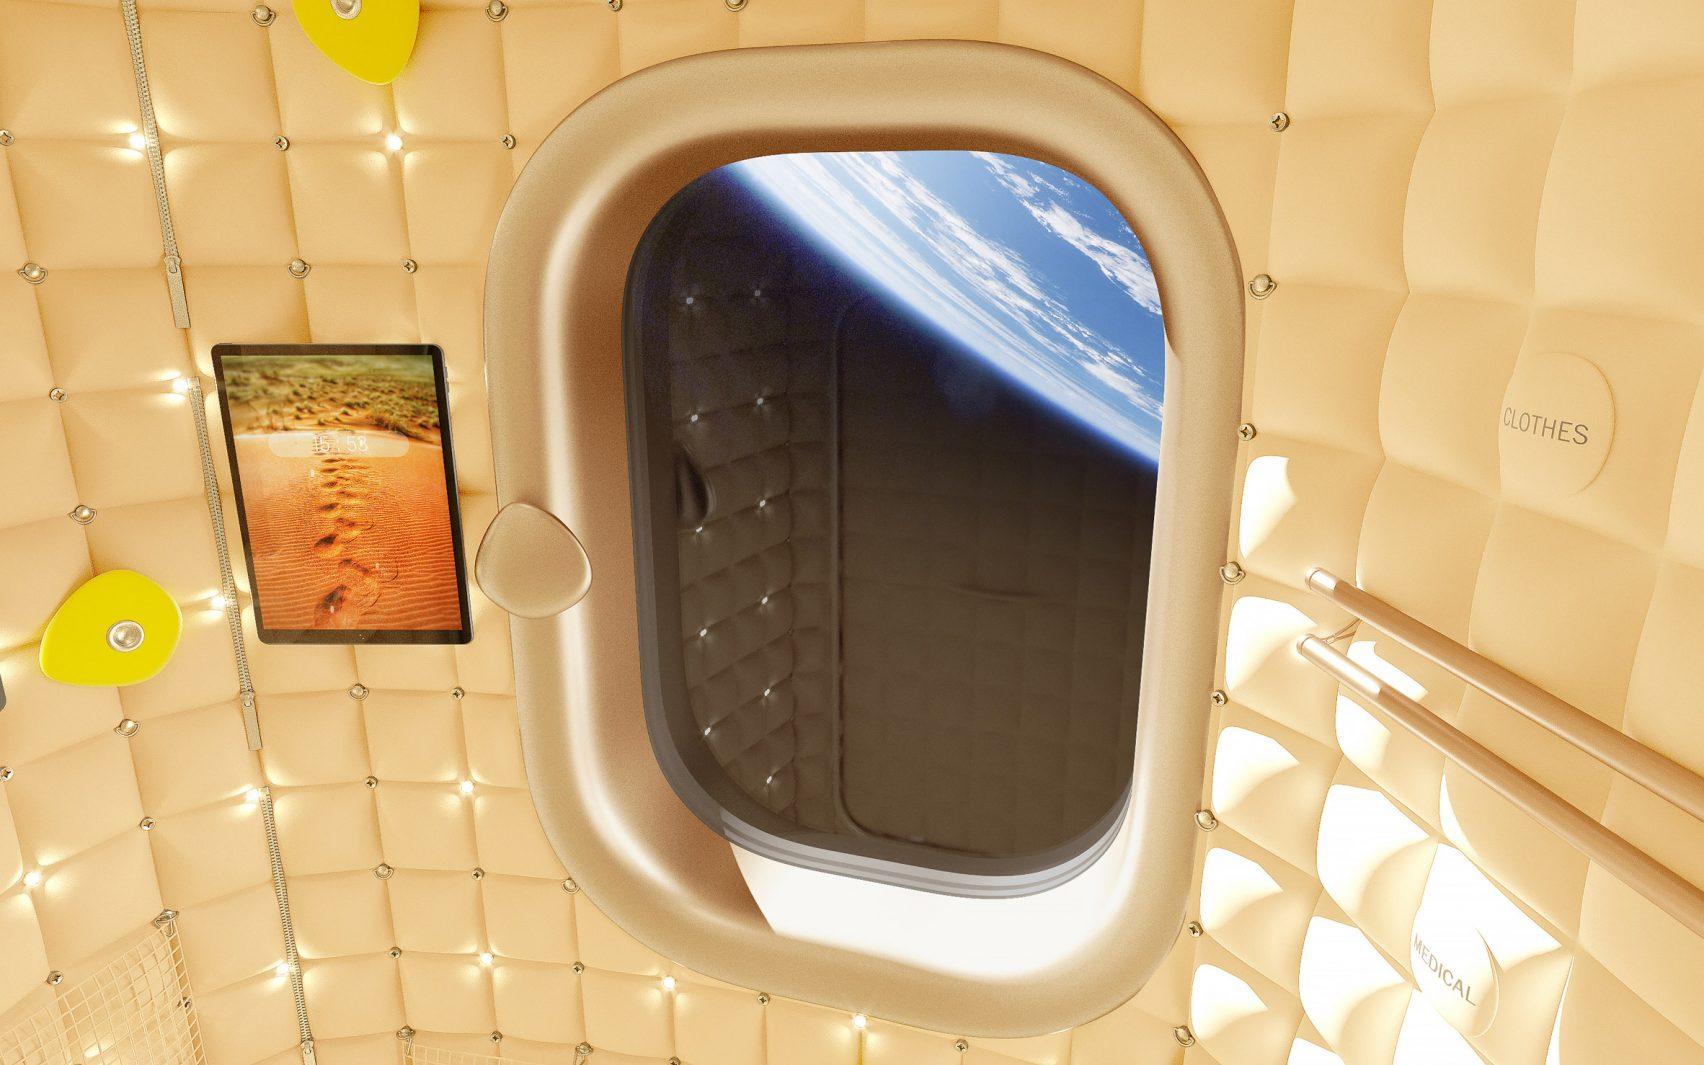 phillippe-starck-axiom-space-module-design_dezeen_2364_col_2-1704x1065.jpg